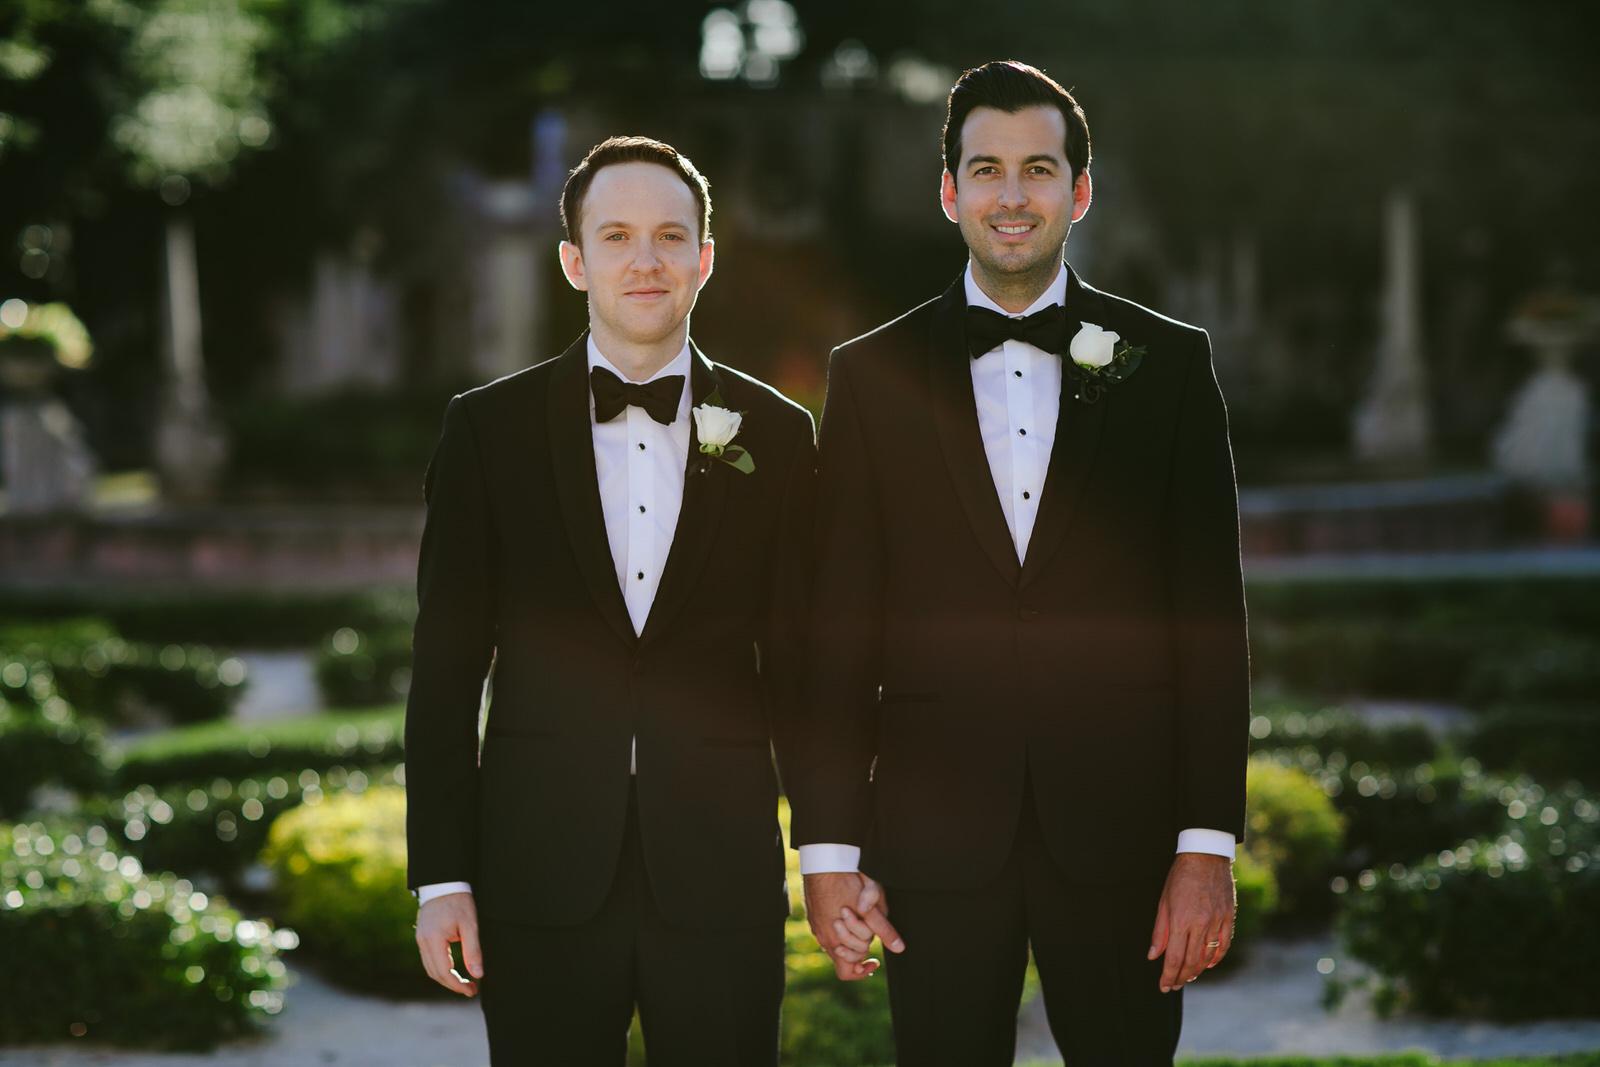 vizcaya_elopement_intimate_wedding_groom_portraits_after_ceremony-60.jpg